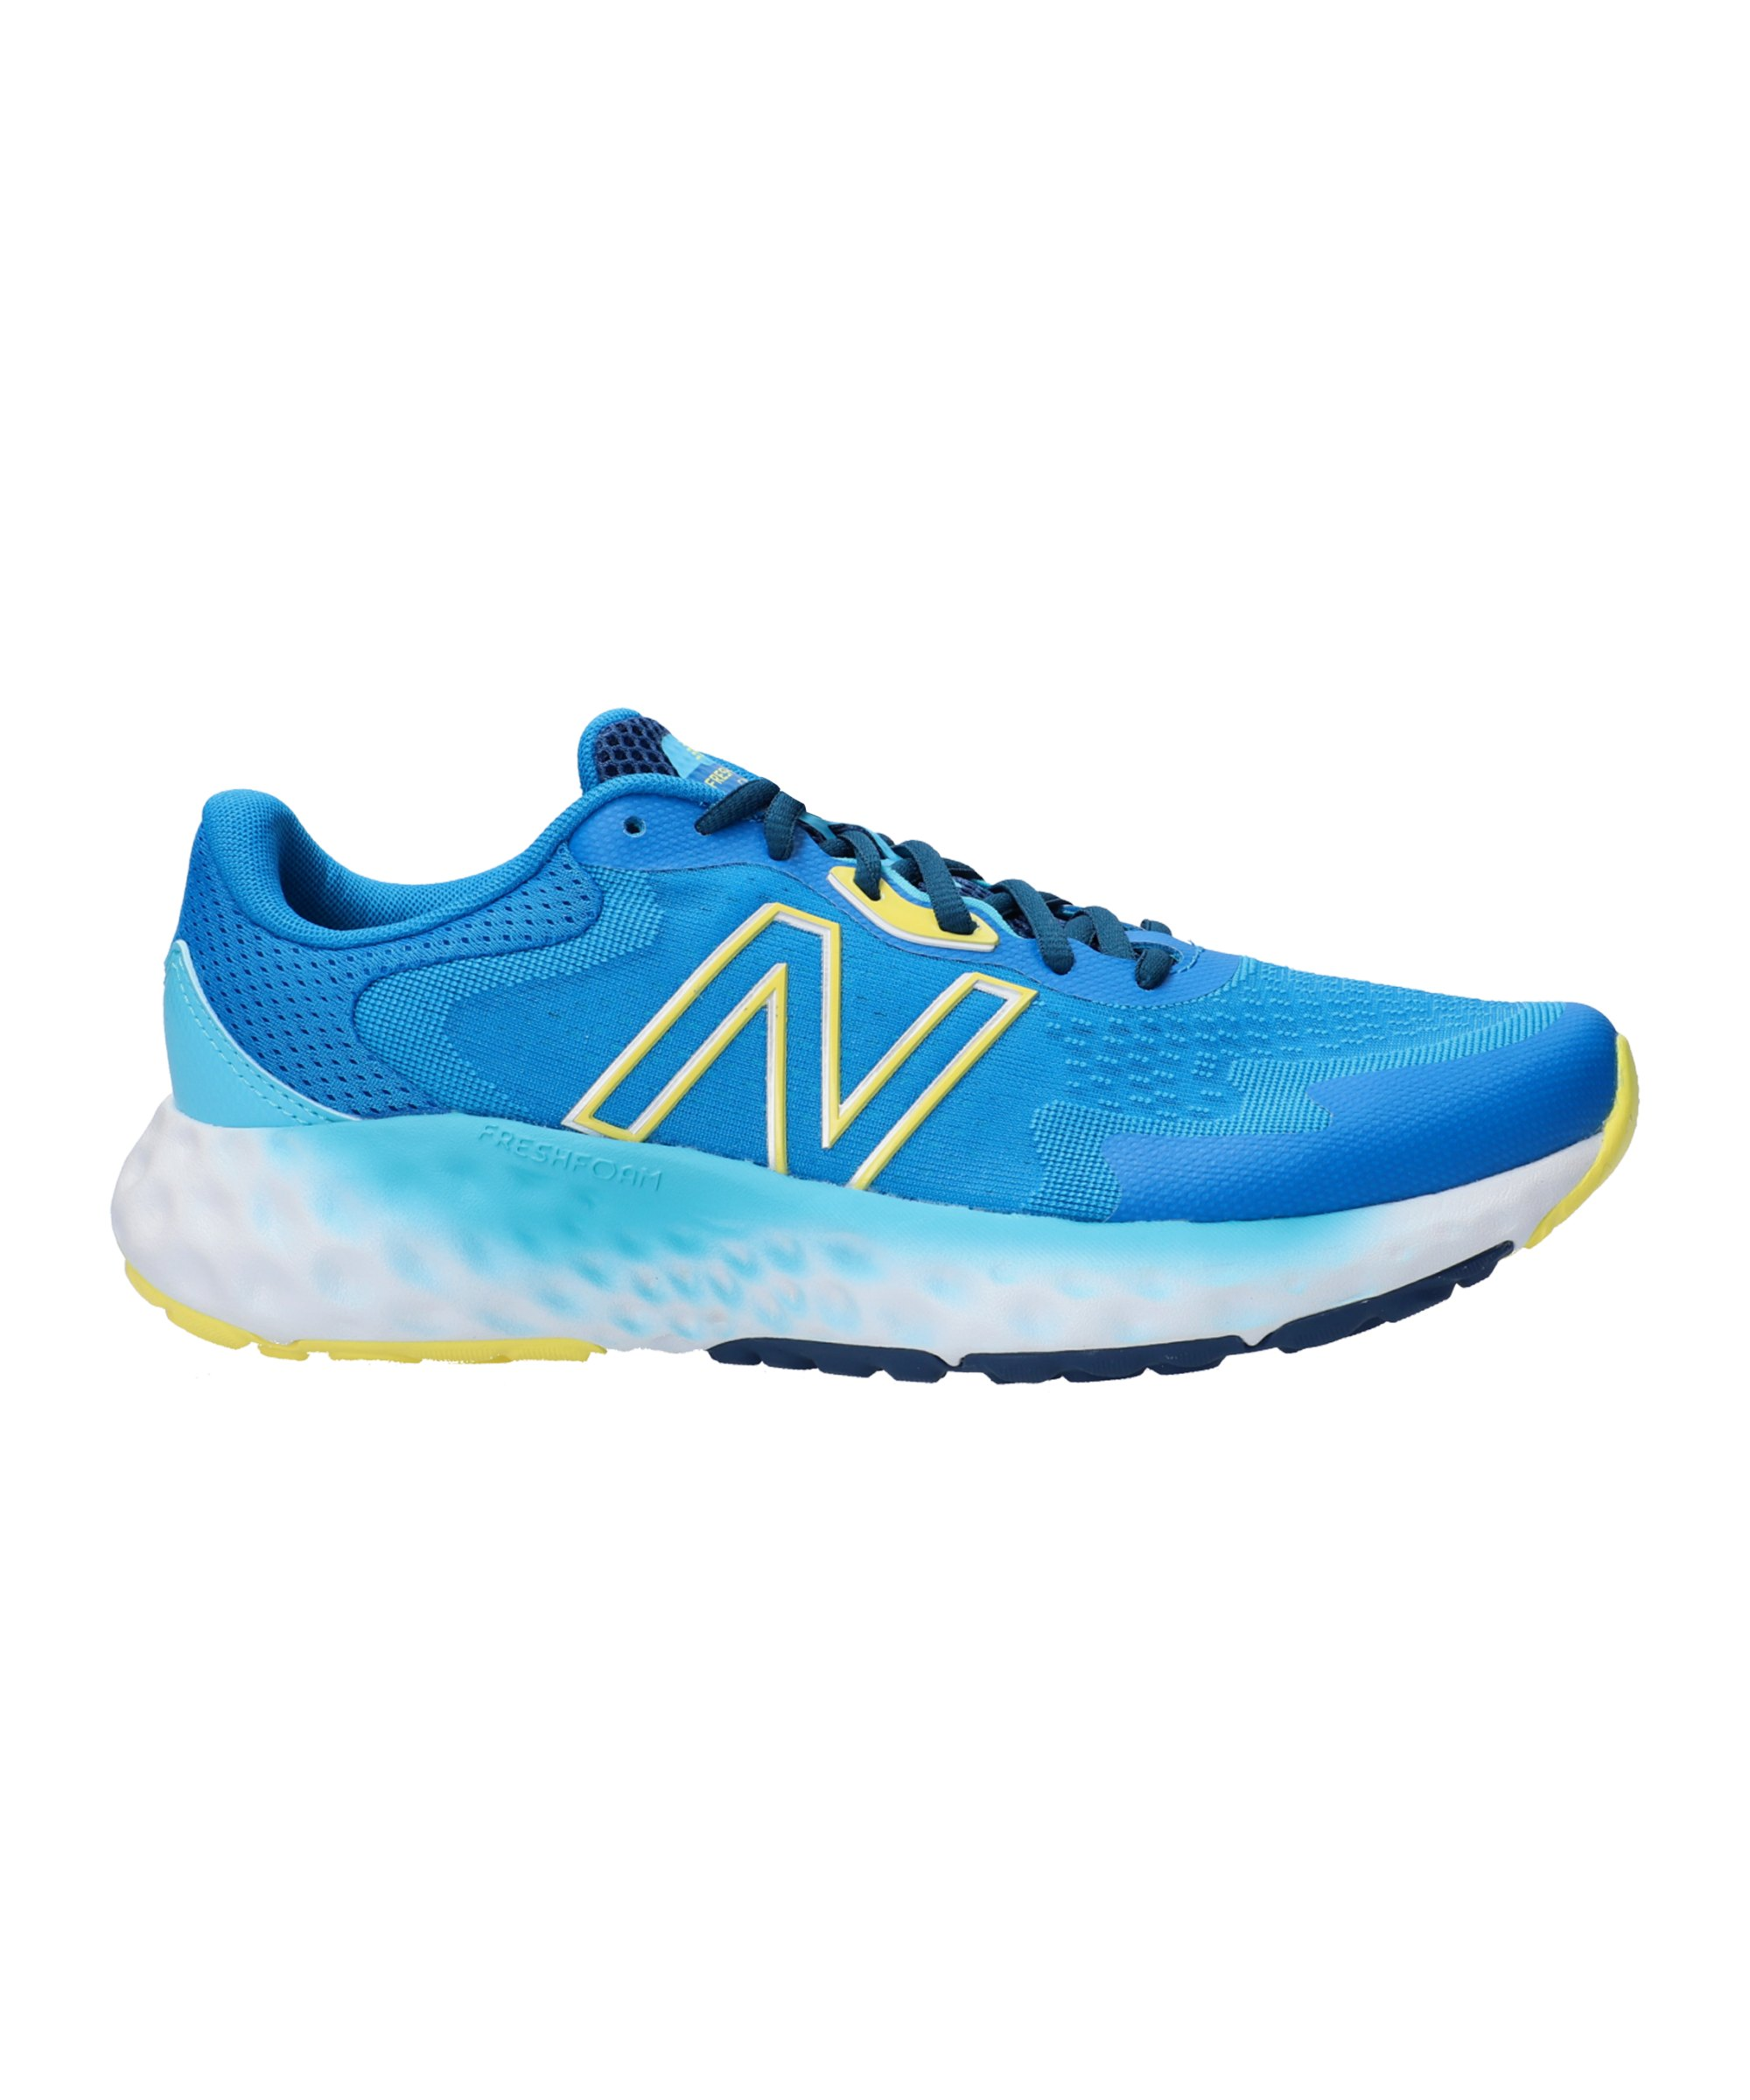 New Balance MEVOZ Running Blau FZLB - blau